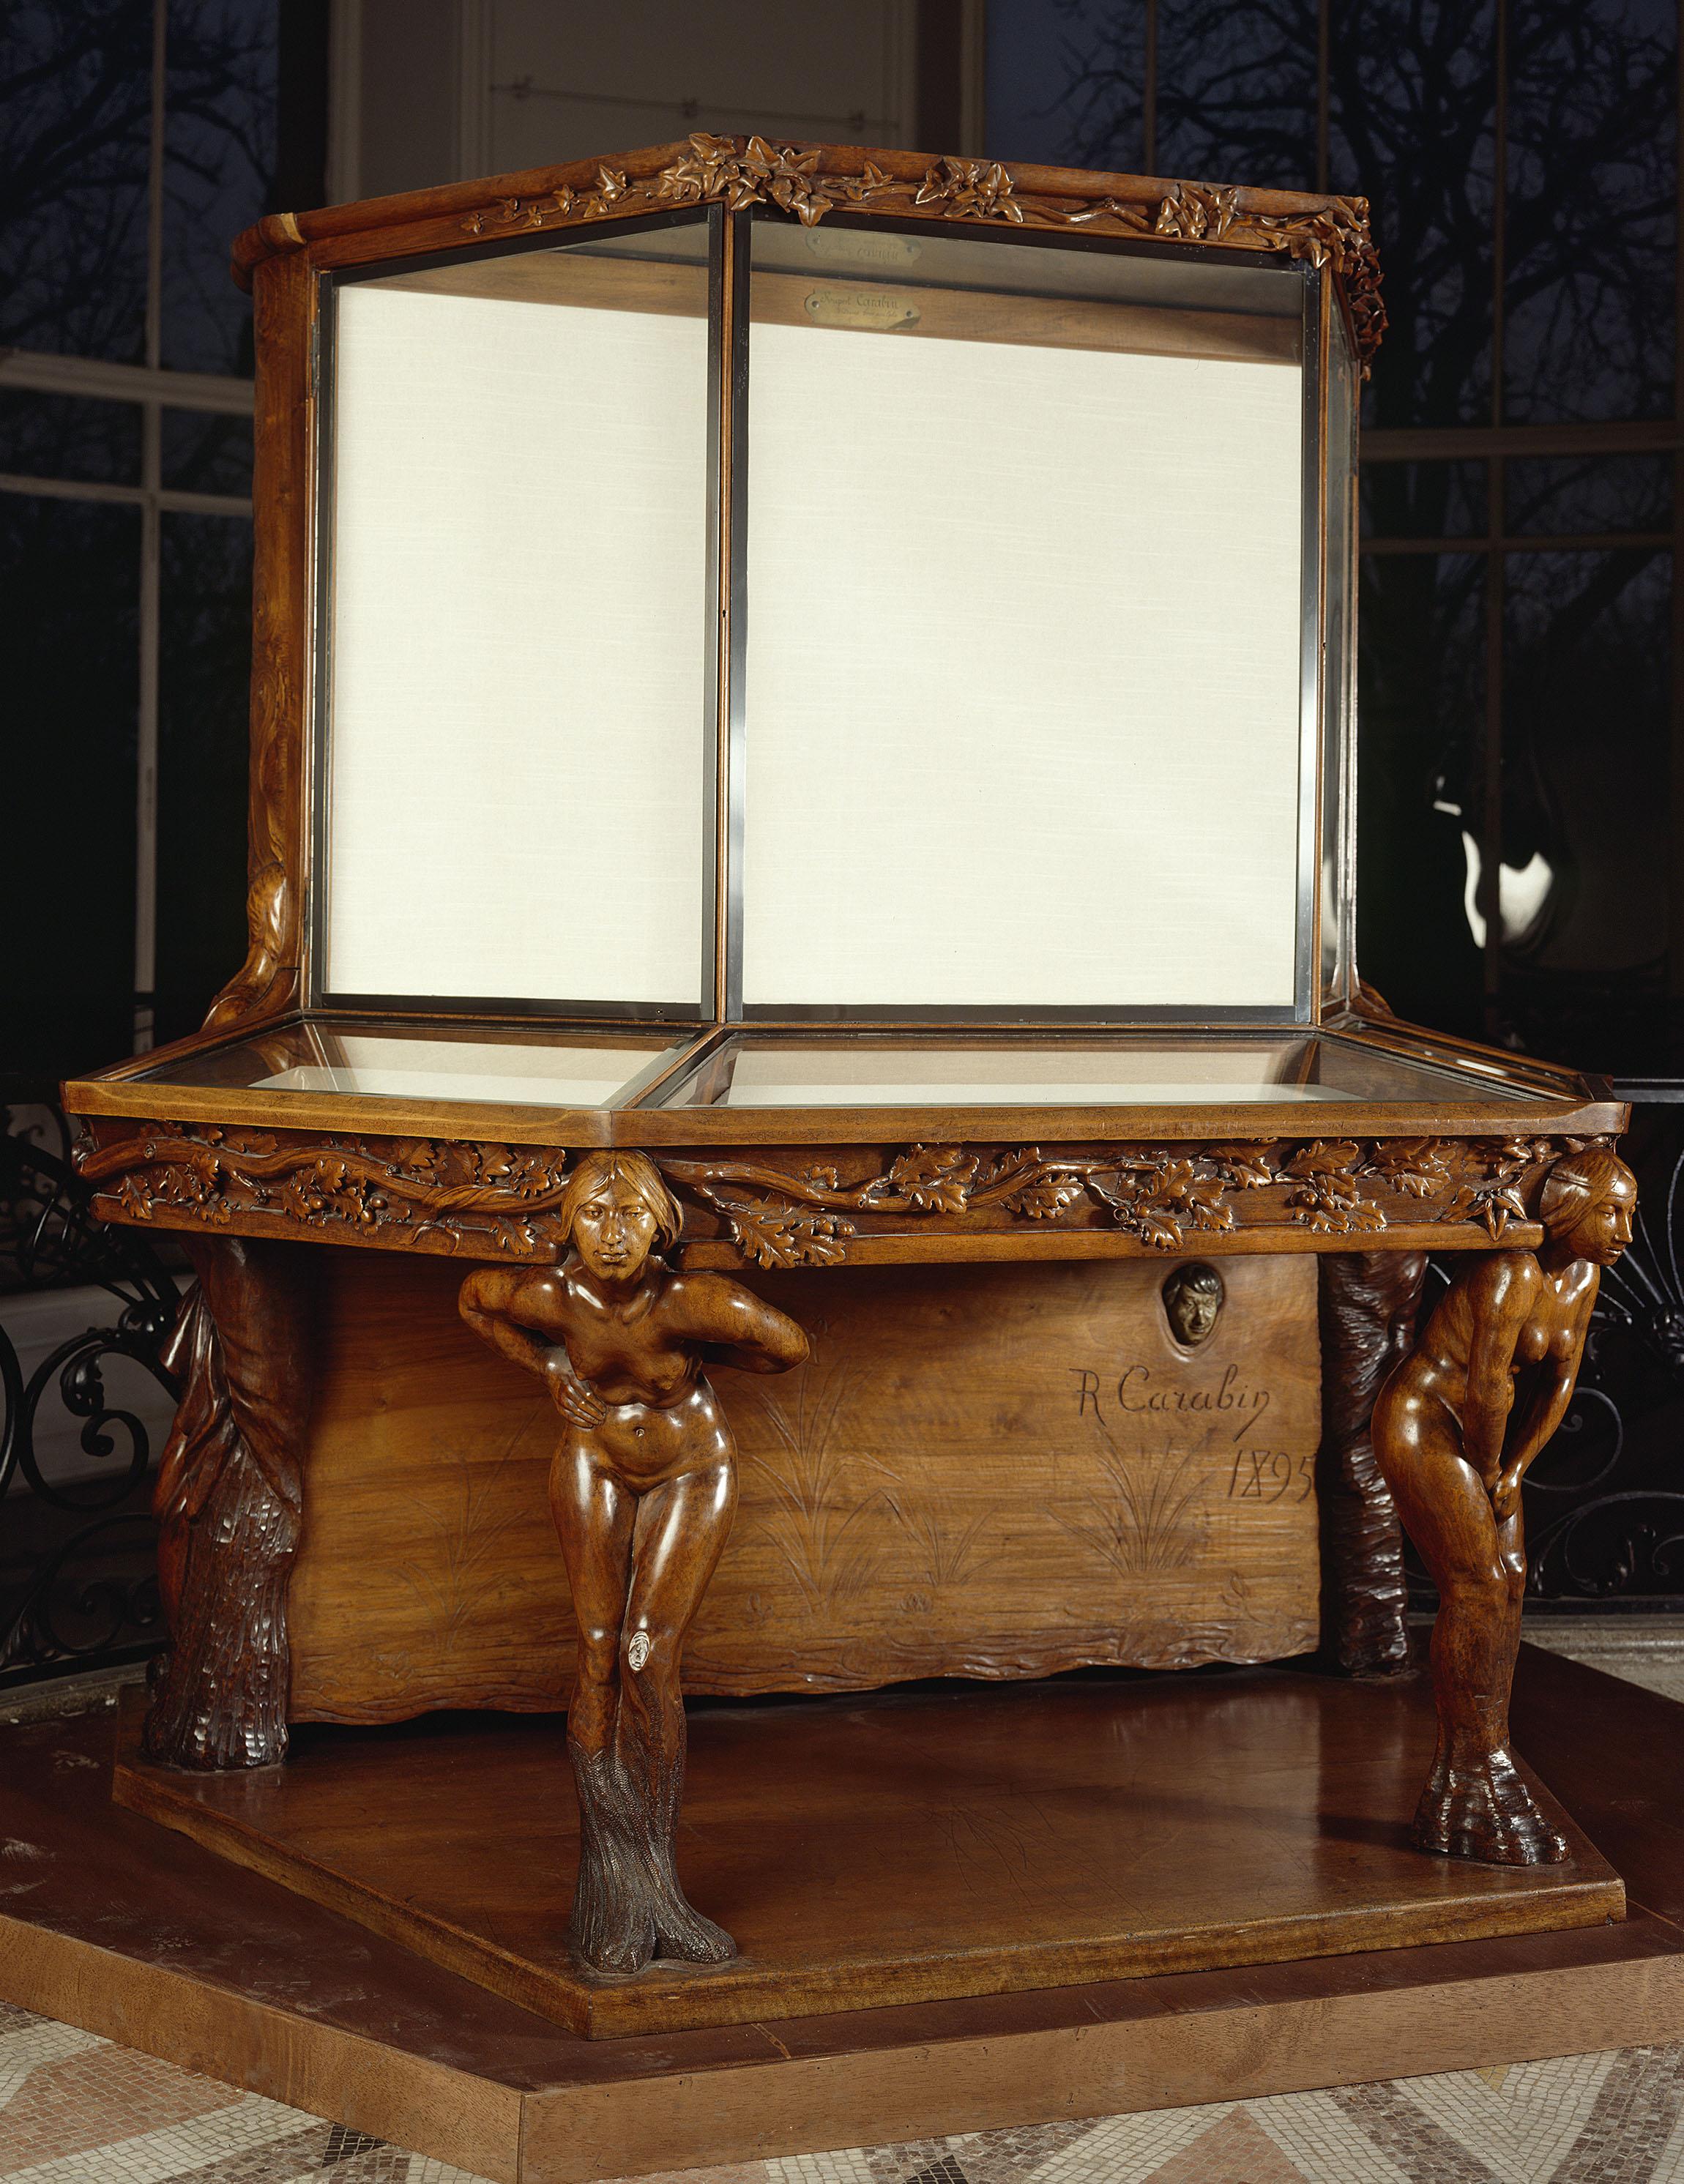 François-Rupert Carabin - Display cabinet